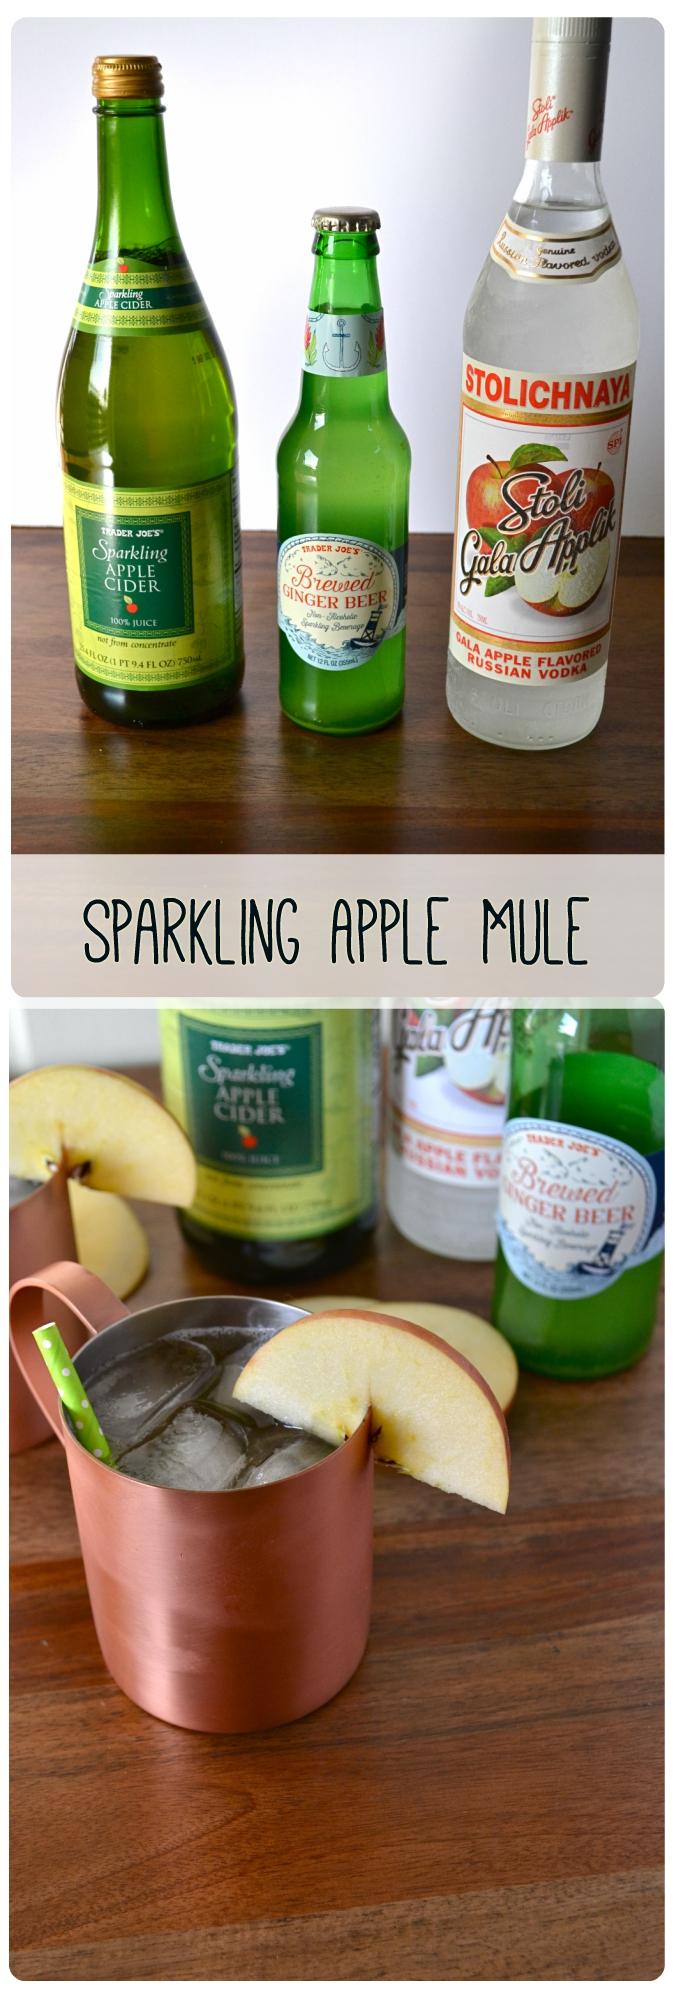 Sparkling Apple Mule